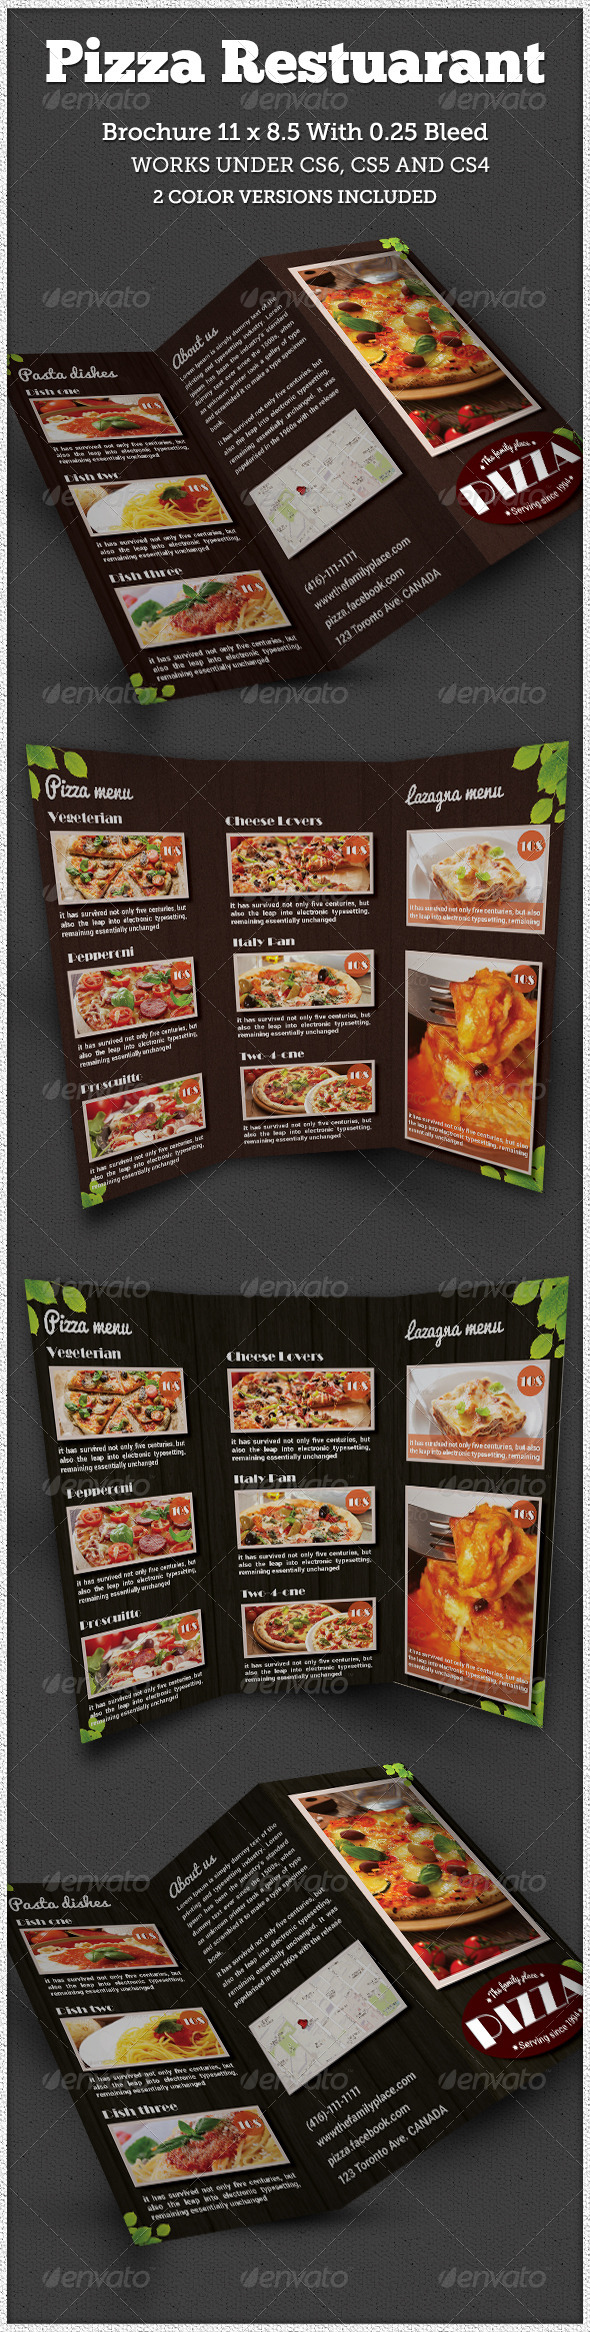 Pizza Restaurant Tri-fold Brochure Indesign - Brochures Print Templates